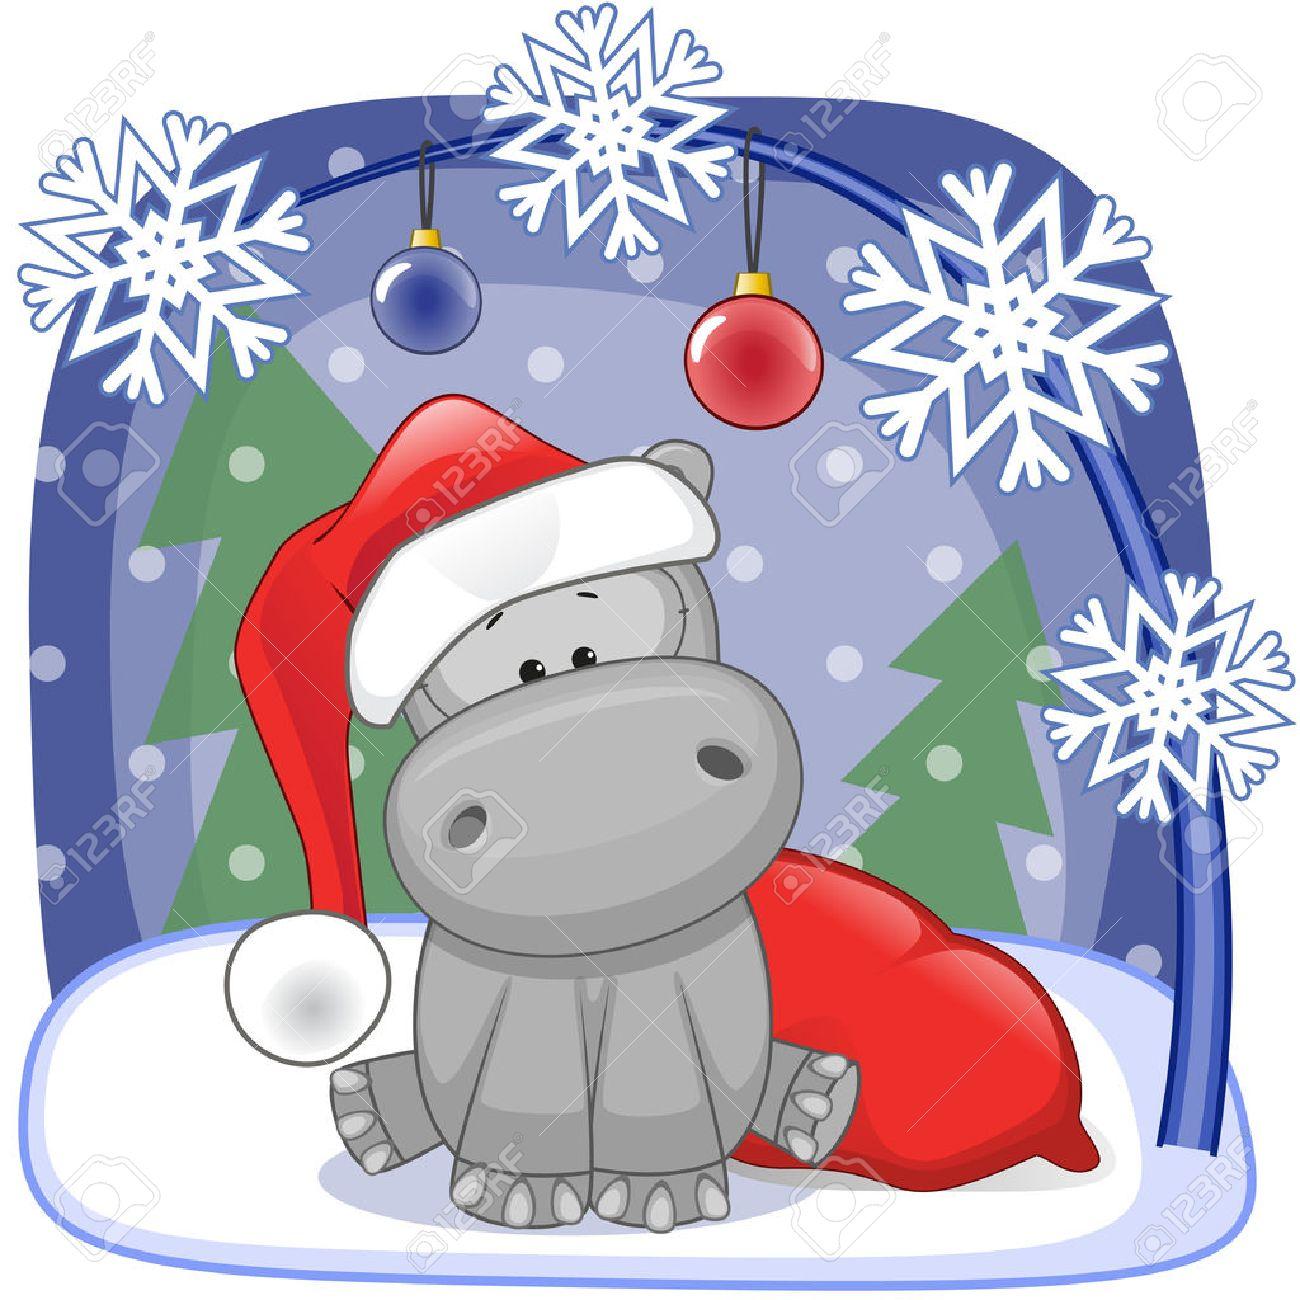 Hippo For Christmas.Christmas Illustration Of Cartoon Santa Hippo